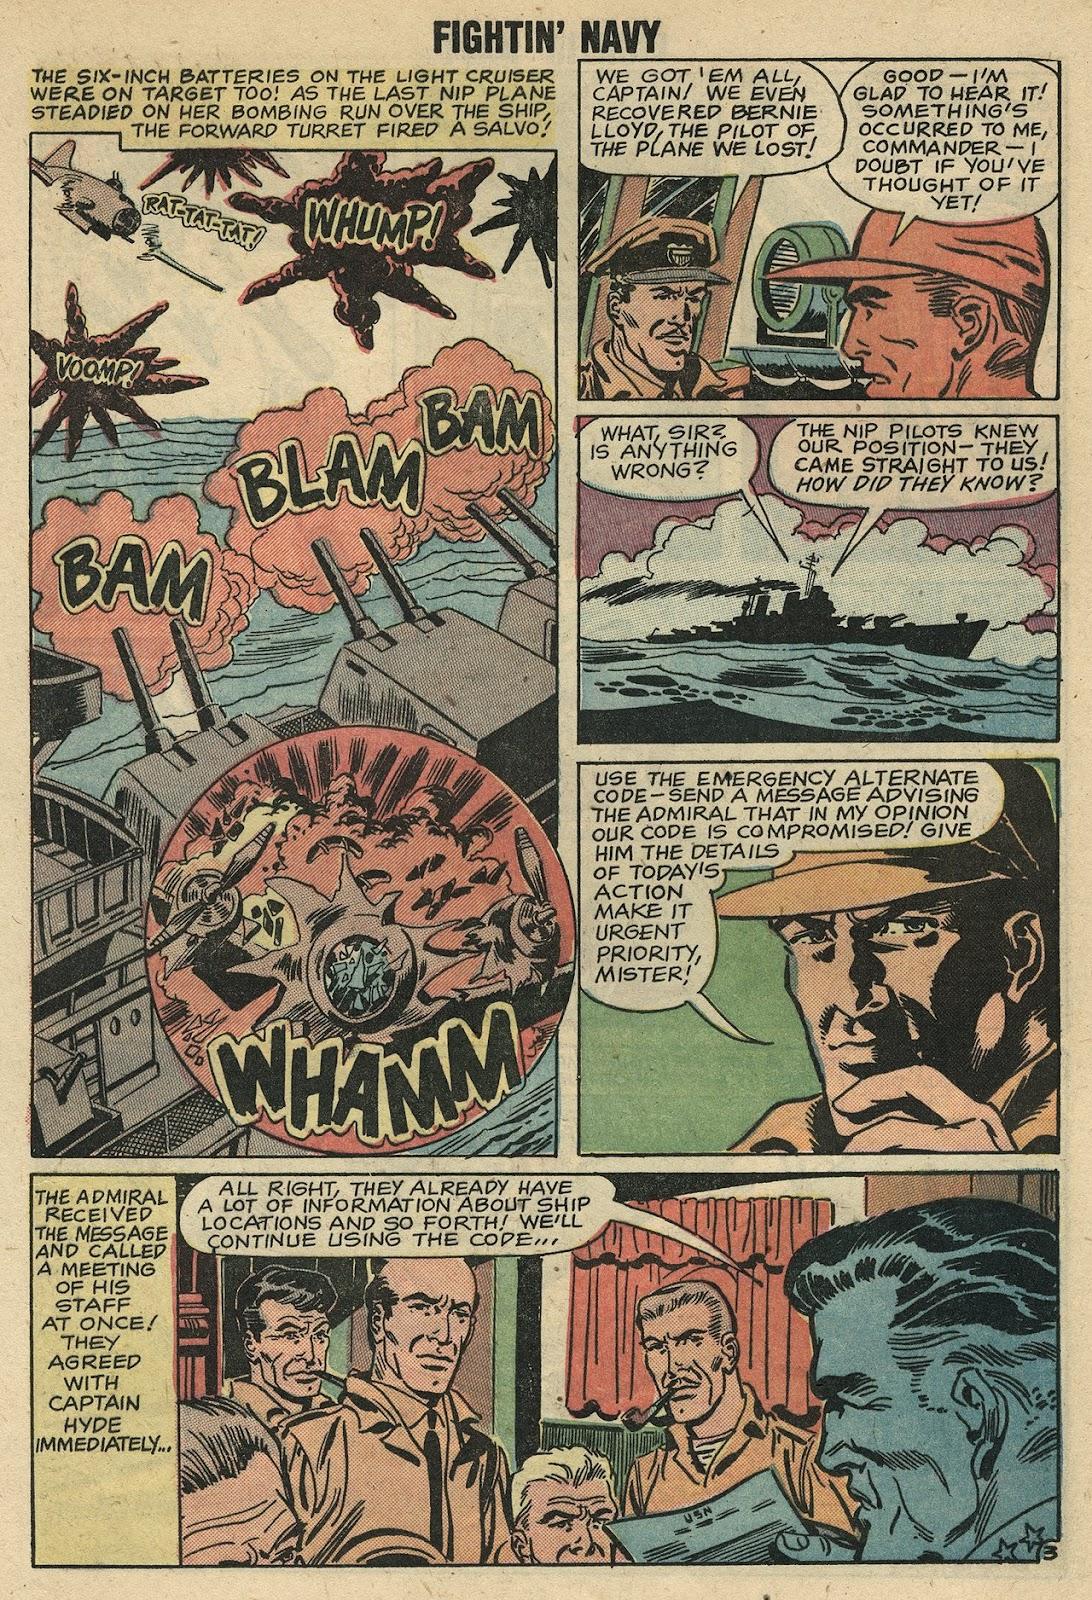 Read online Fightin' Navy comic -  Issue #86 - 23